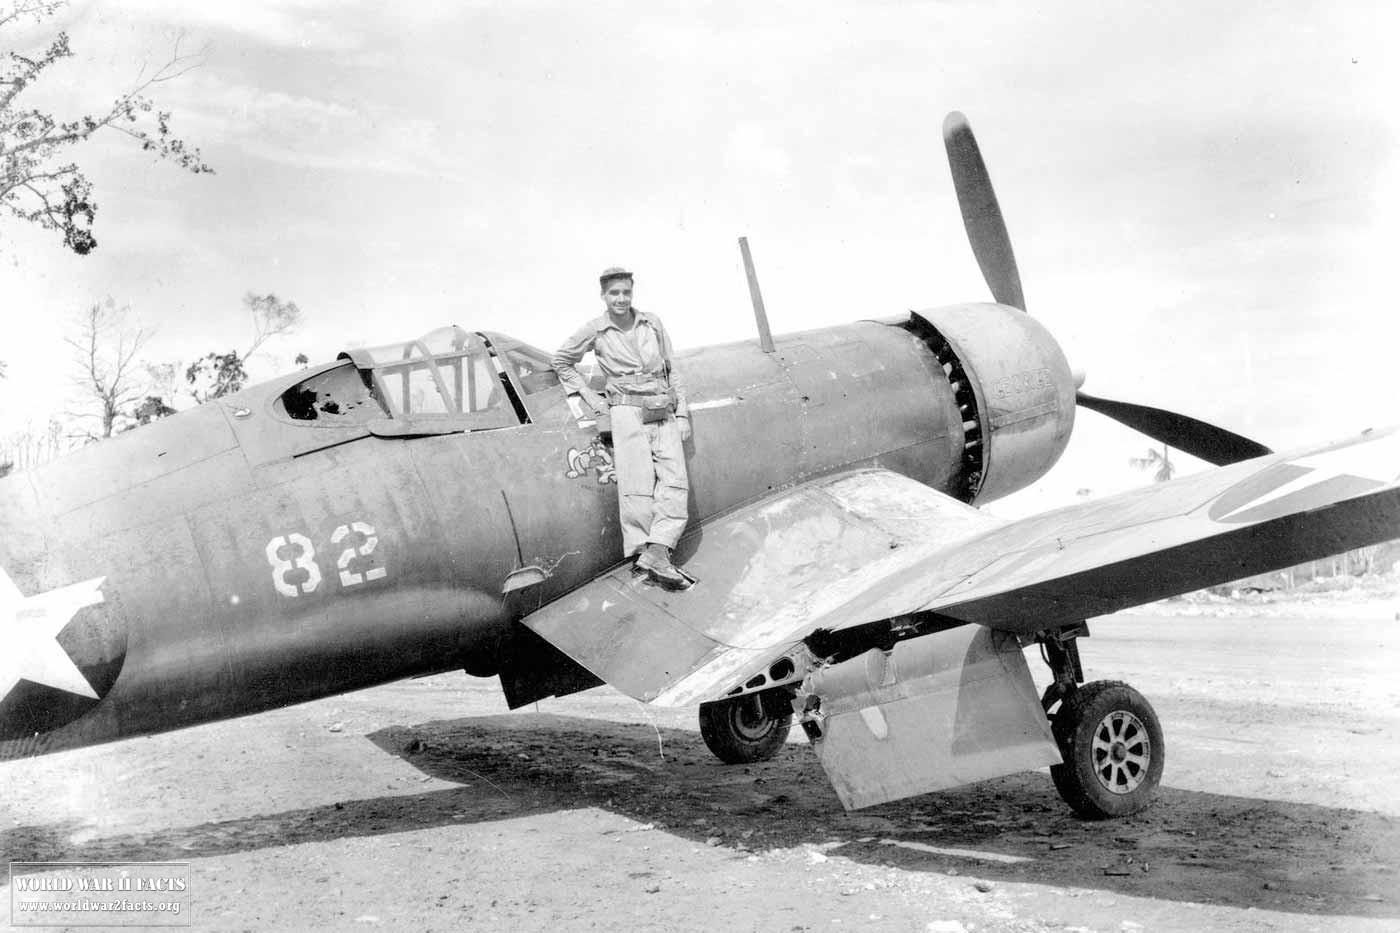 f4u corsair facts world war 2 facts